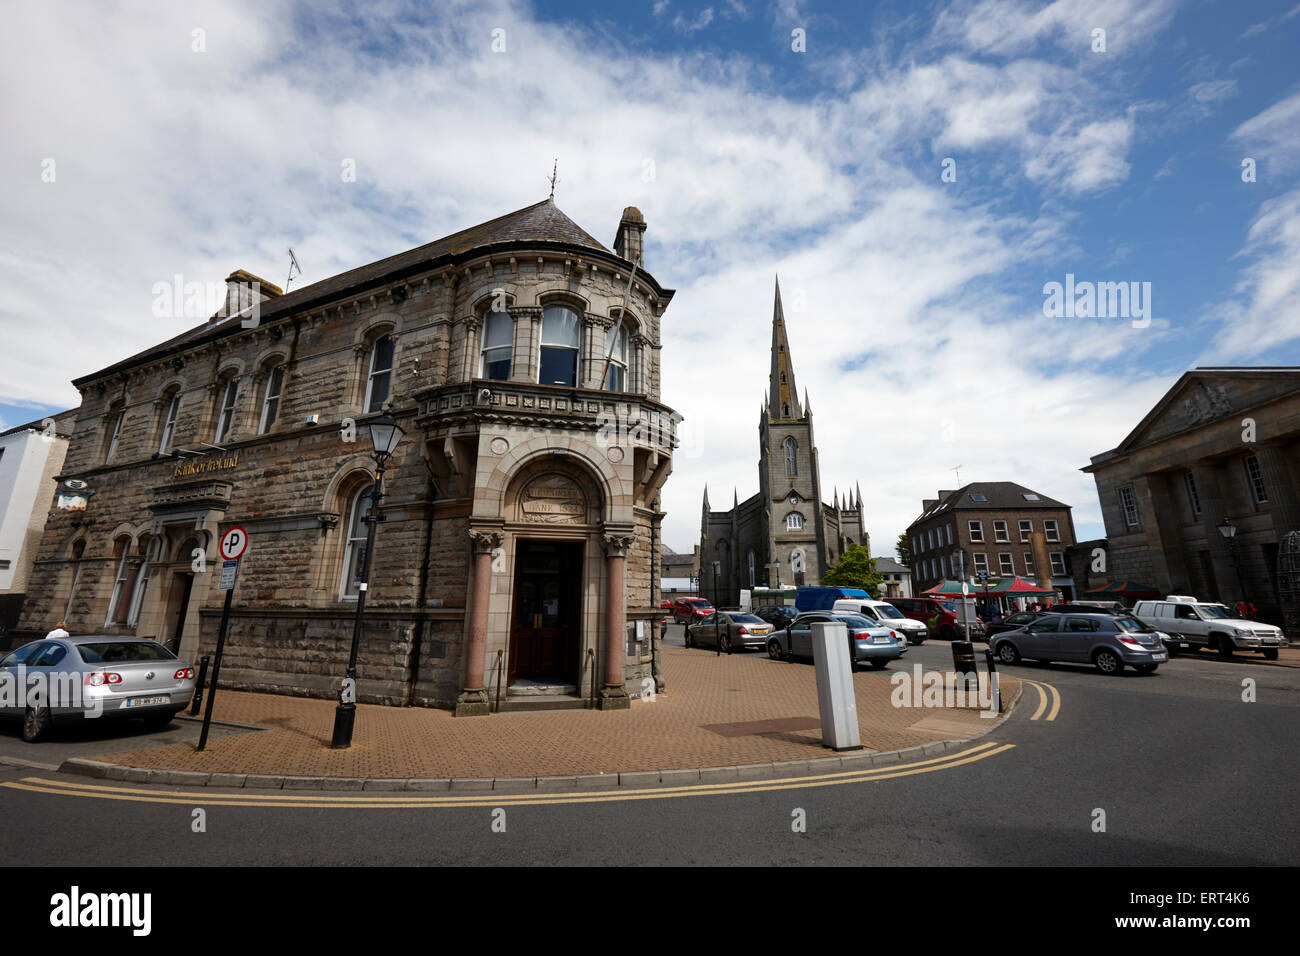 The Bank of Ireland building former hibernian bank monaghan town county monaghan republic of ireland - Stock Image